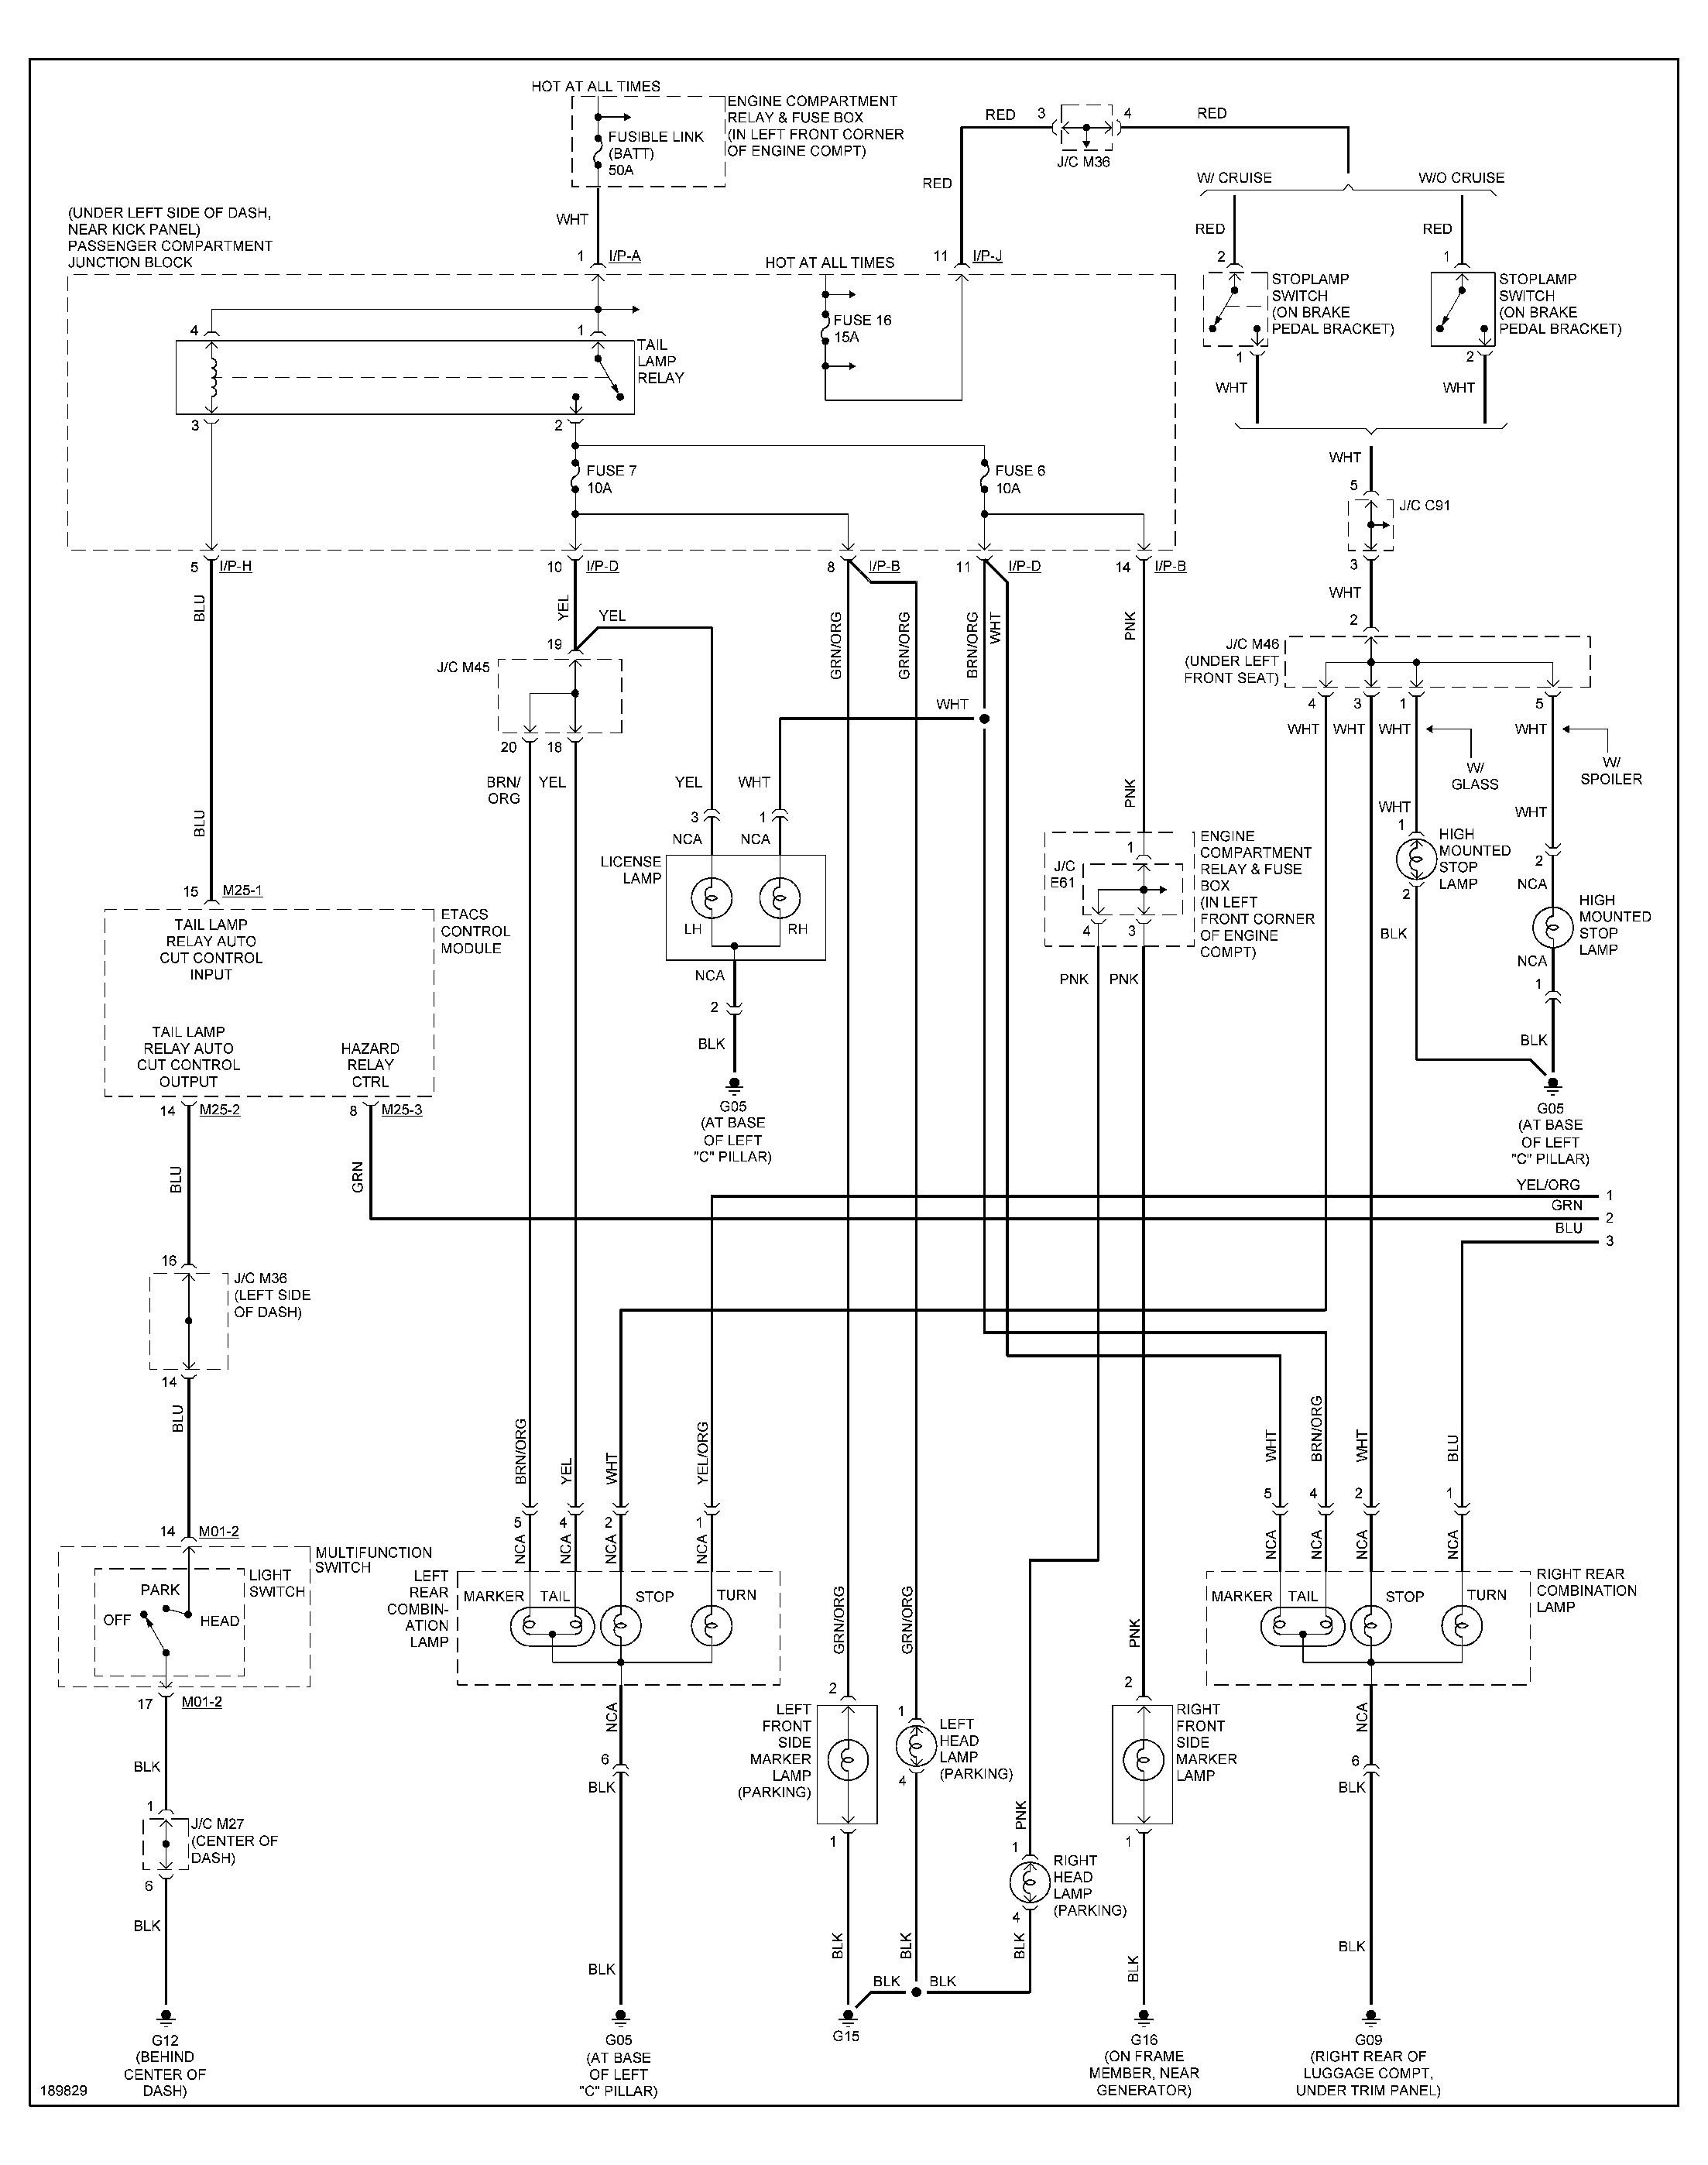 Power Acoustik In Dash Wiring Diagrams   Manual E-Books - Power Acoustik Pdn-626B Wiring Diagram